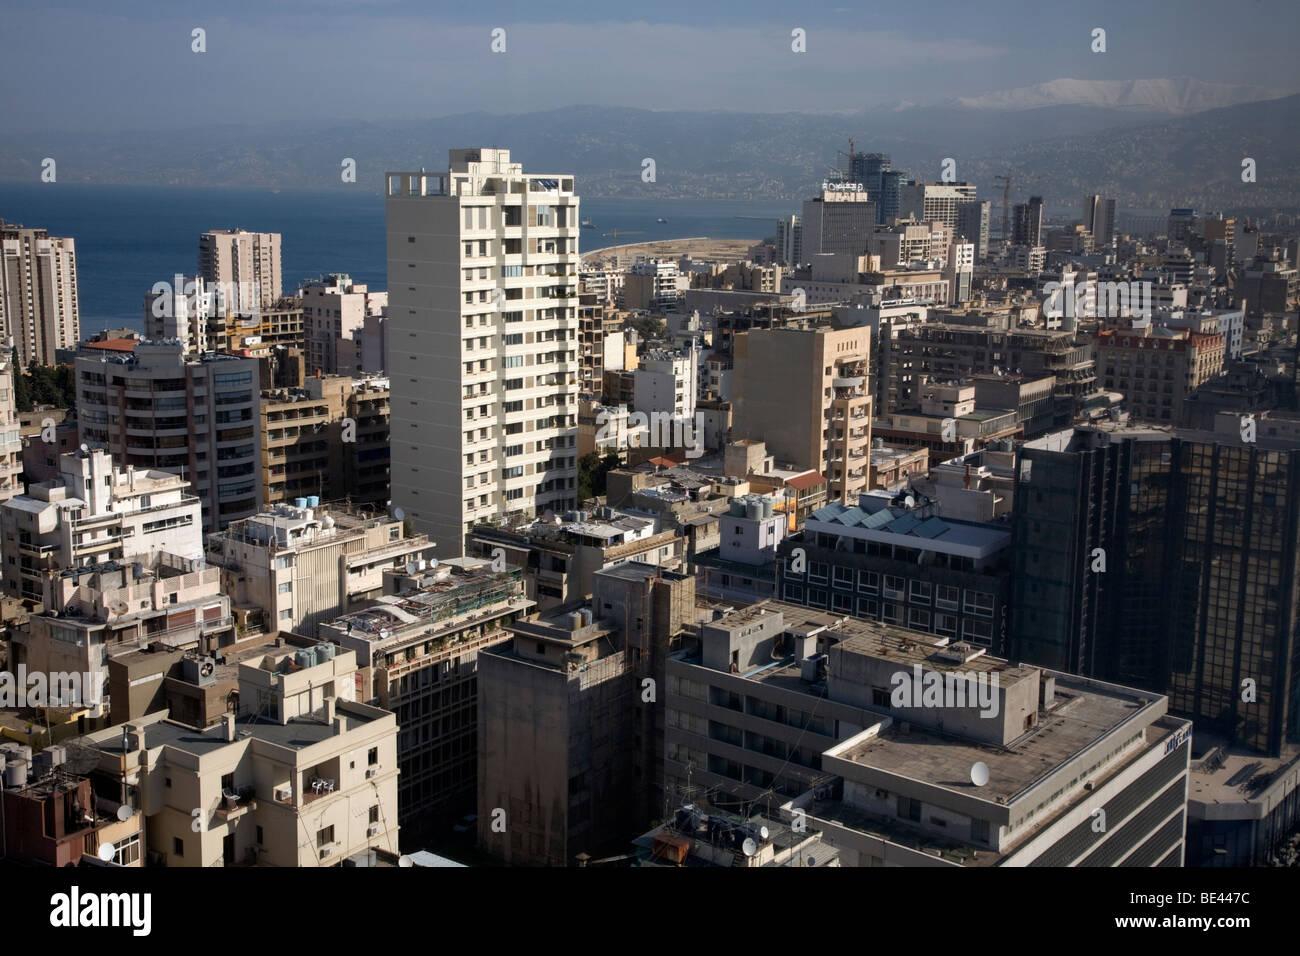 Birdeye Vista del distrito comercial de Beirut Beirut, Líbano bloques de apartamentos Imagen De Stock